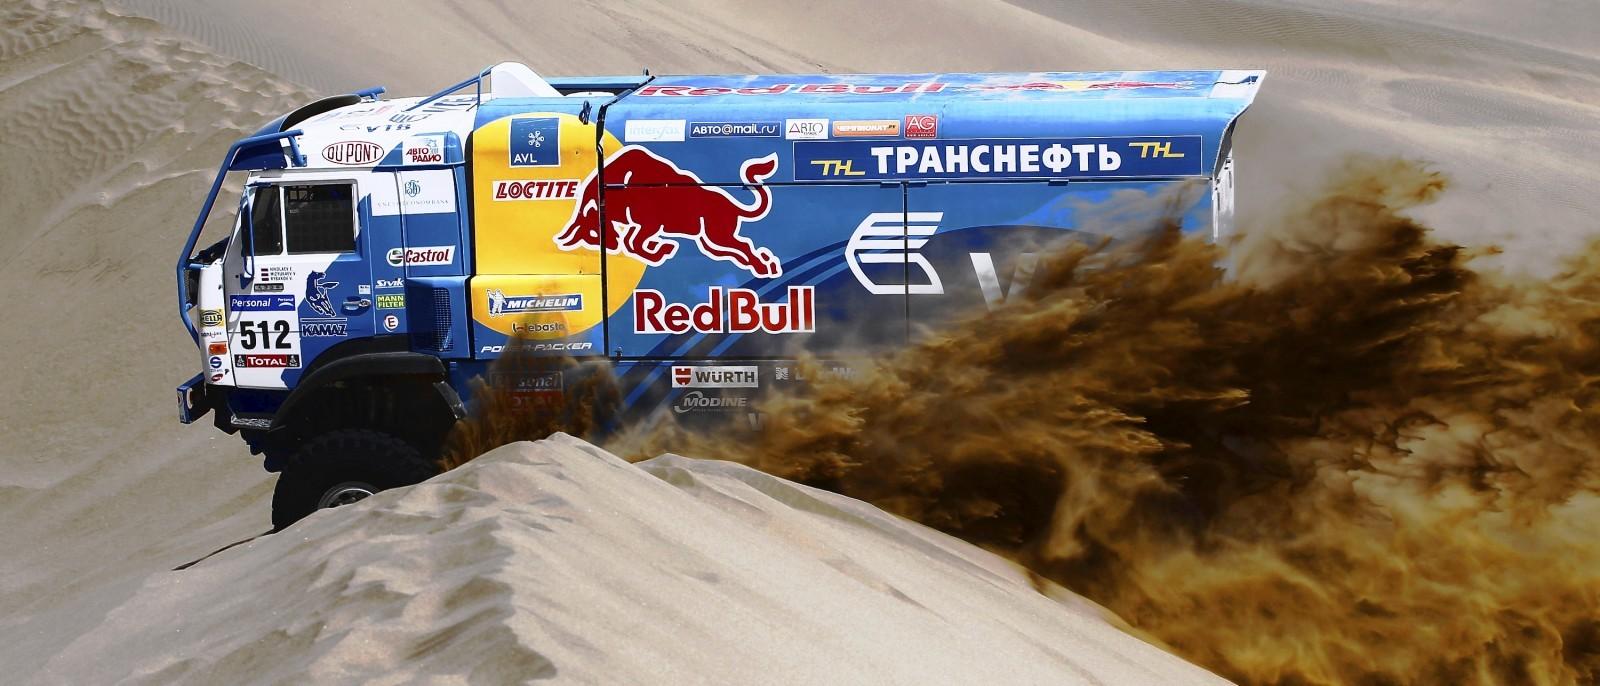 Unimog Nemesis - Red Bull KAMAZ 4911 - Dakar T4 Hero  8